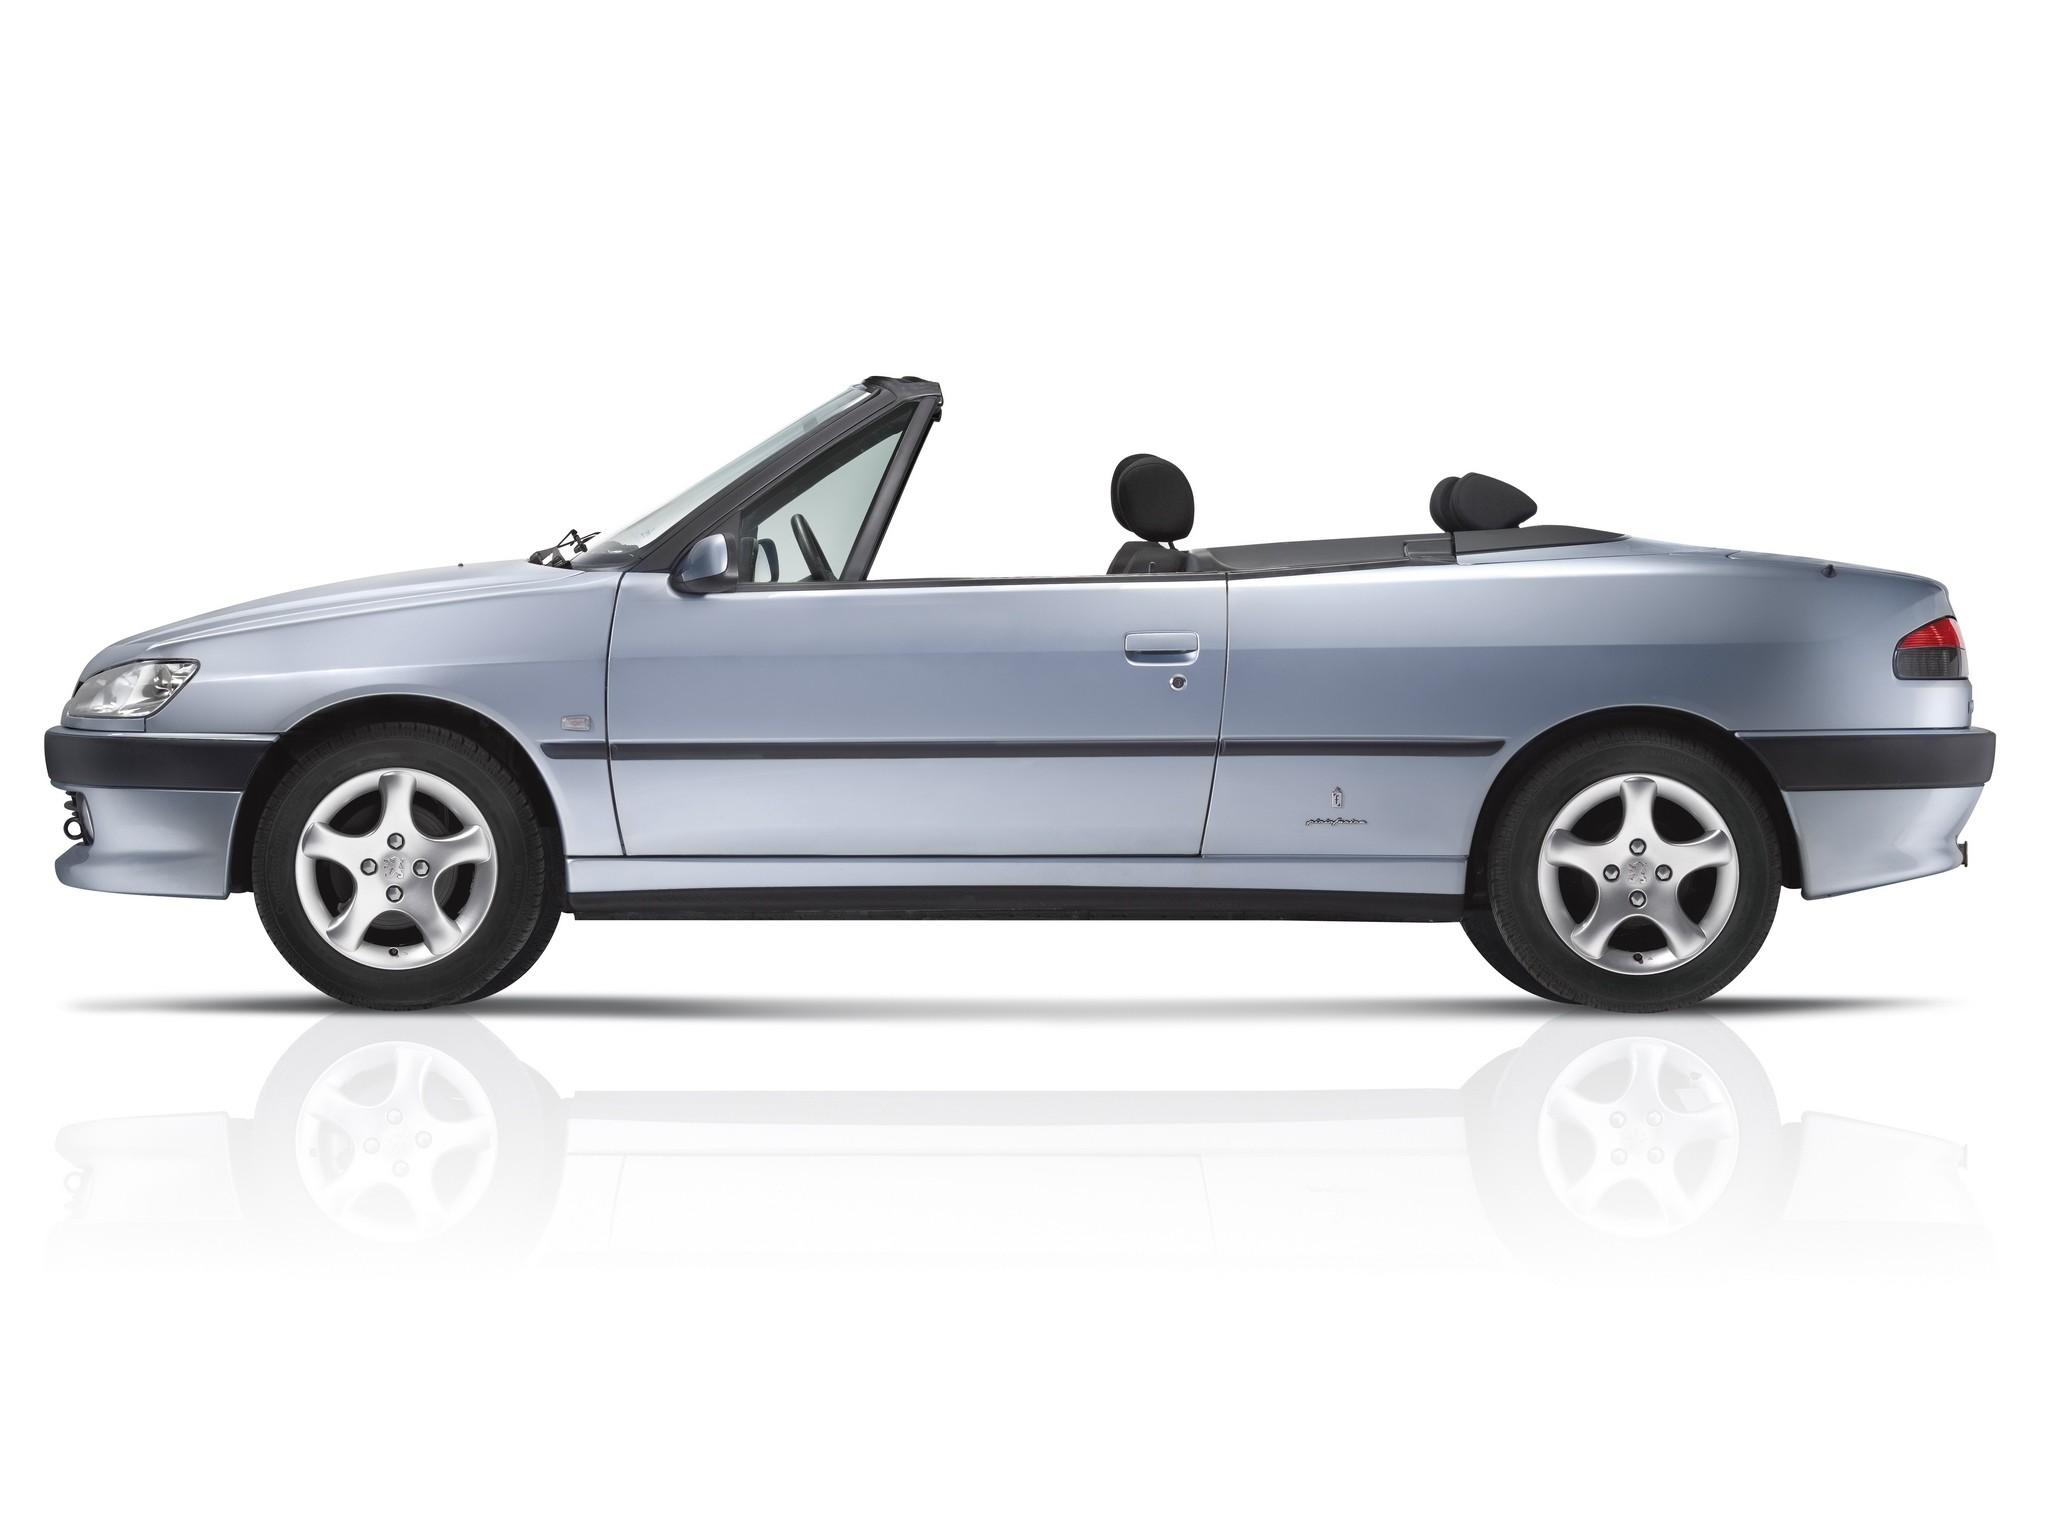 PEUGEOT 306 Cabriolet specs - 1997, 1998, 1999, 2000, 2001, 2002 ...